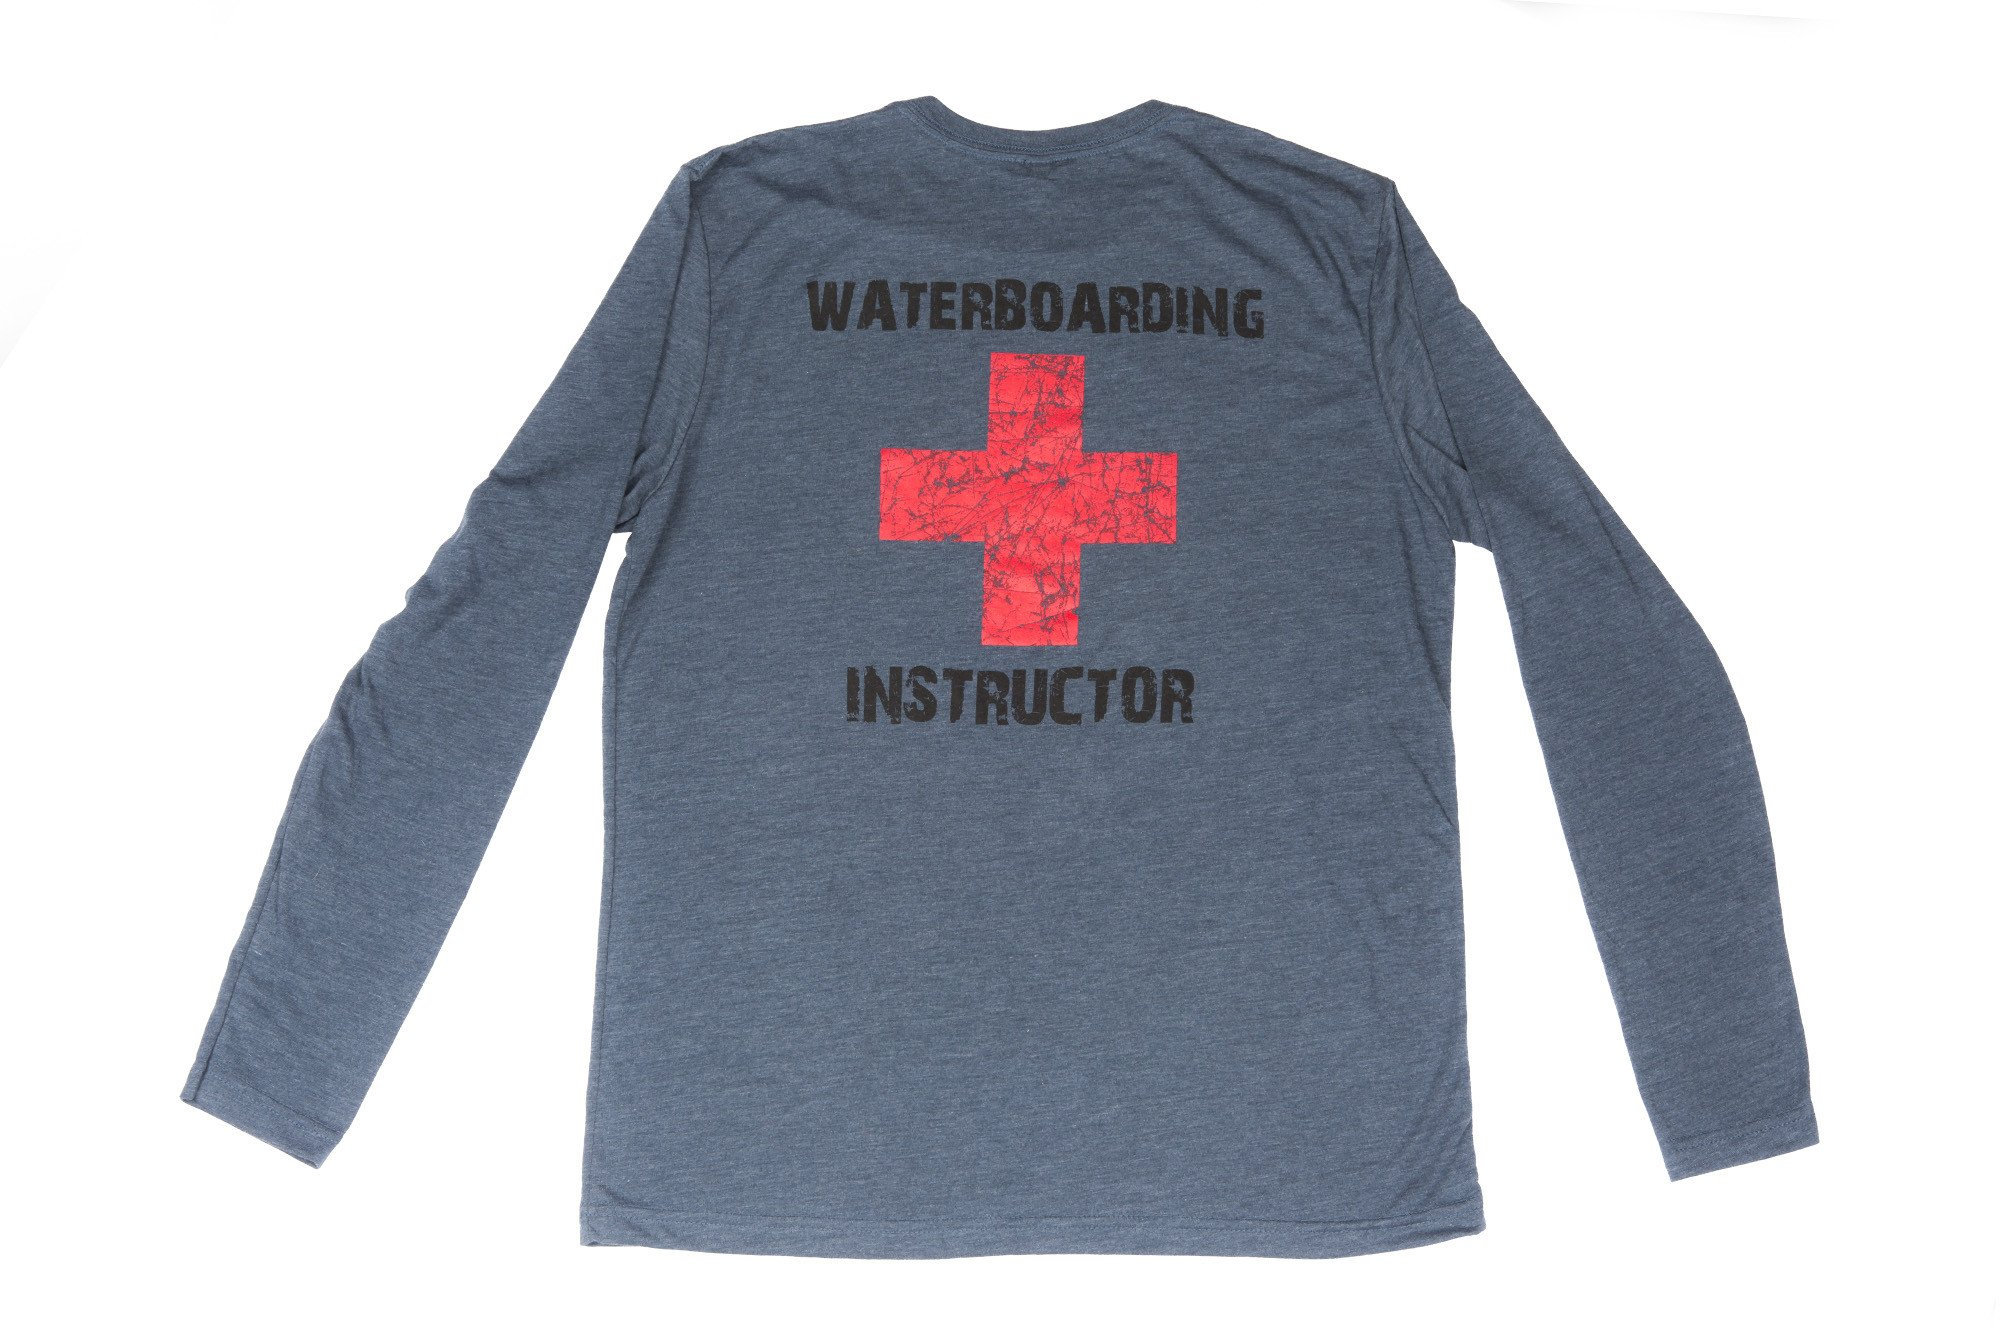 Waterboarding Instructor Long Sleeve